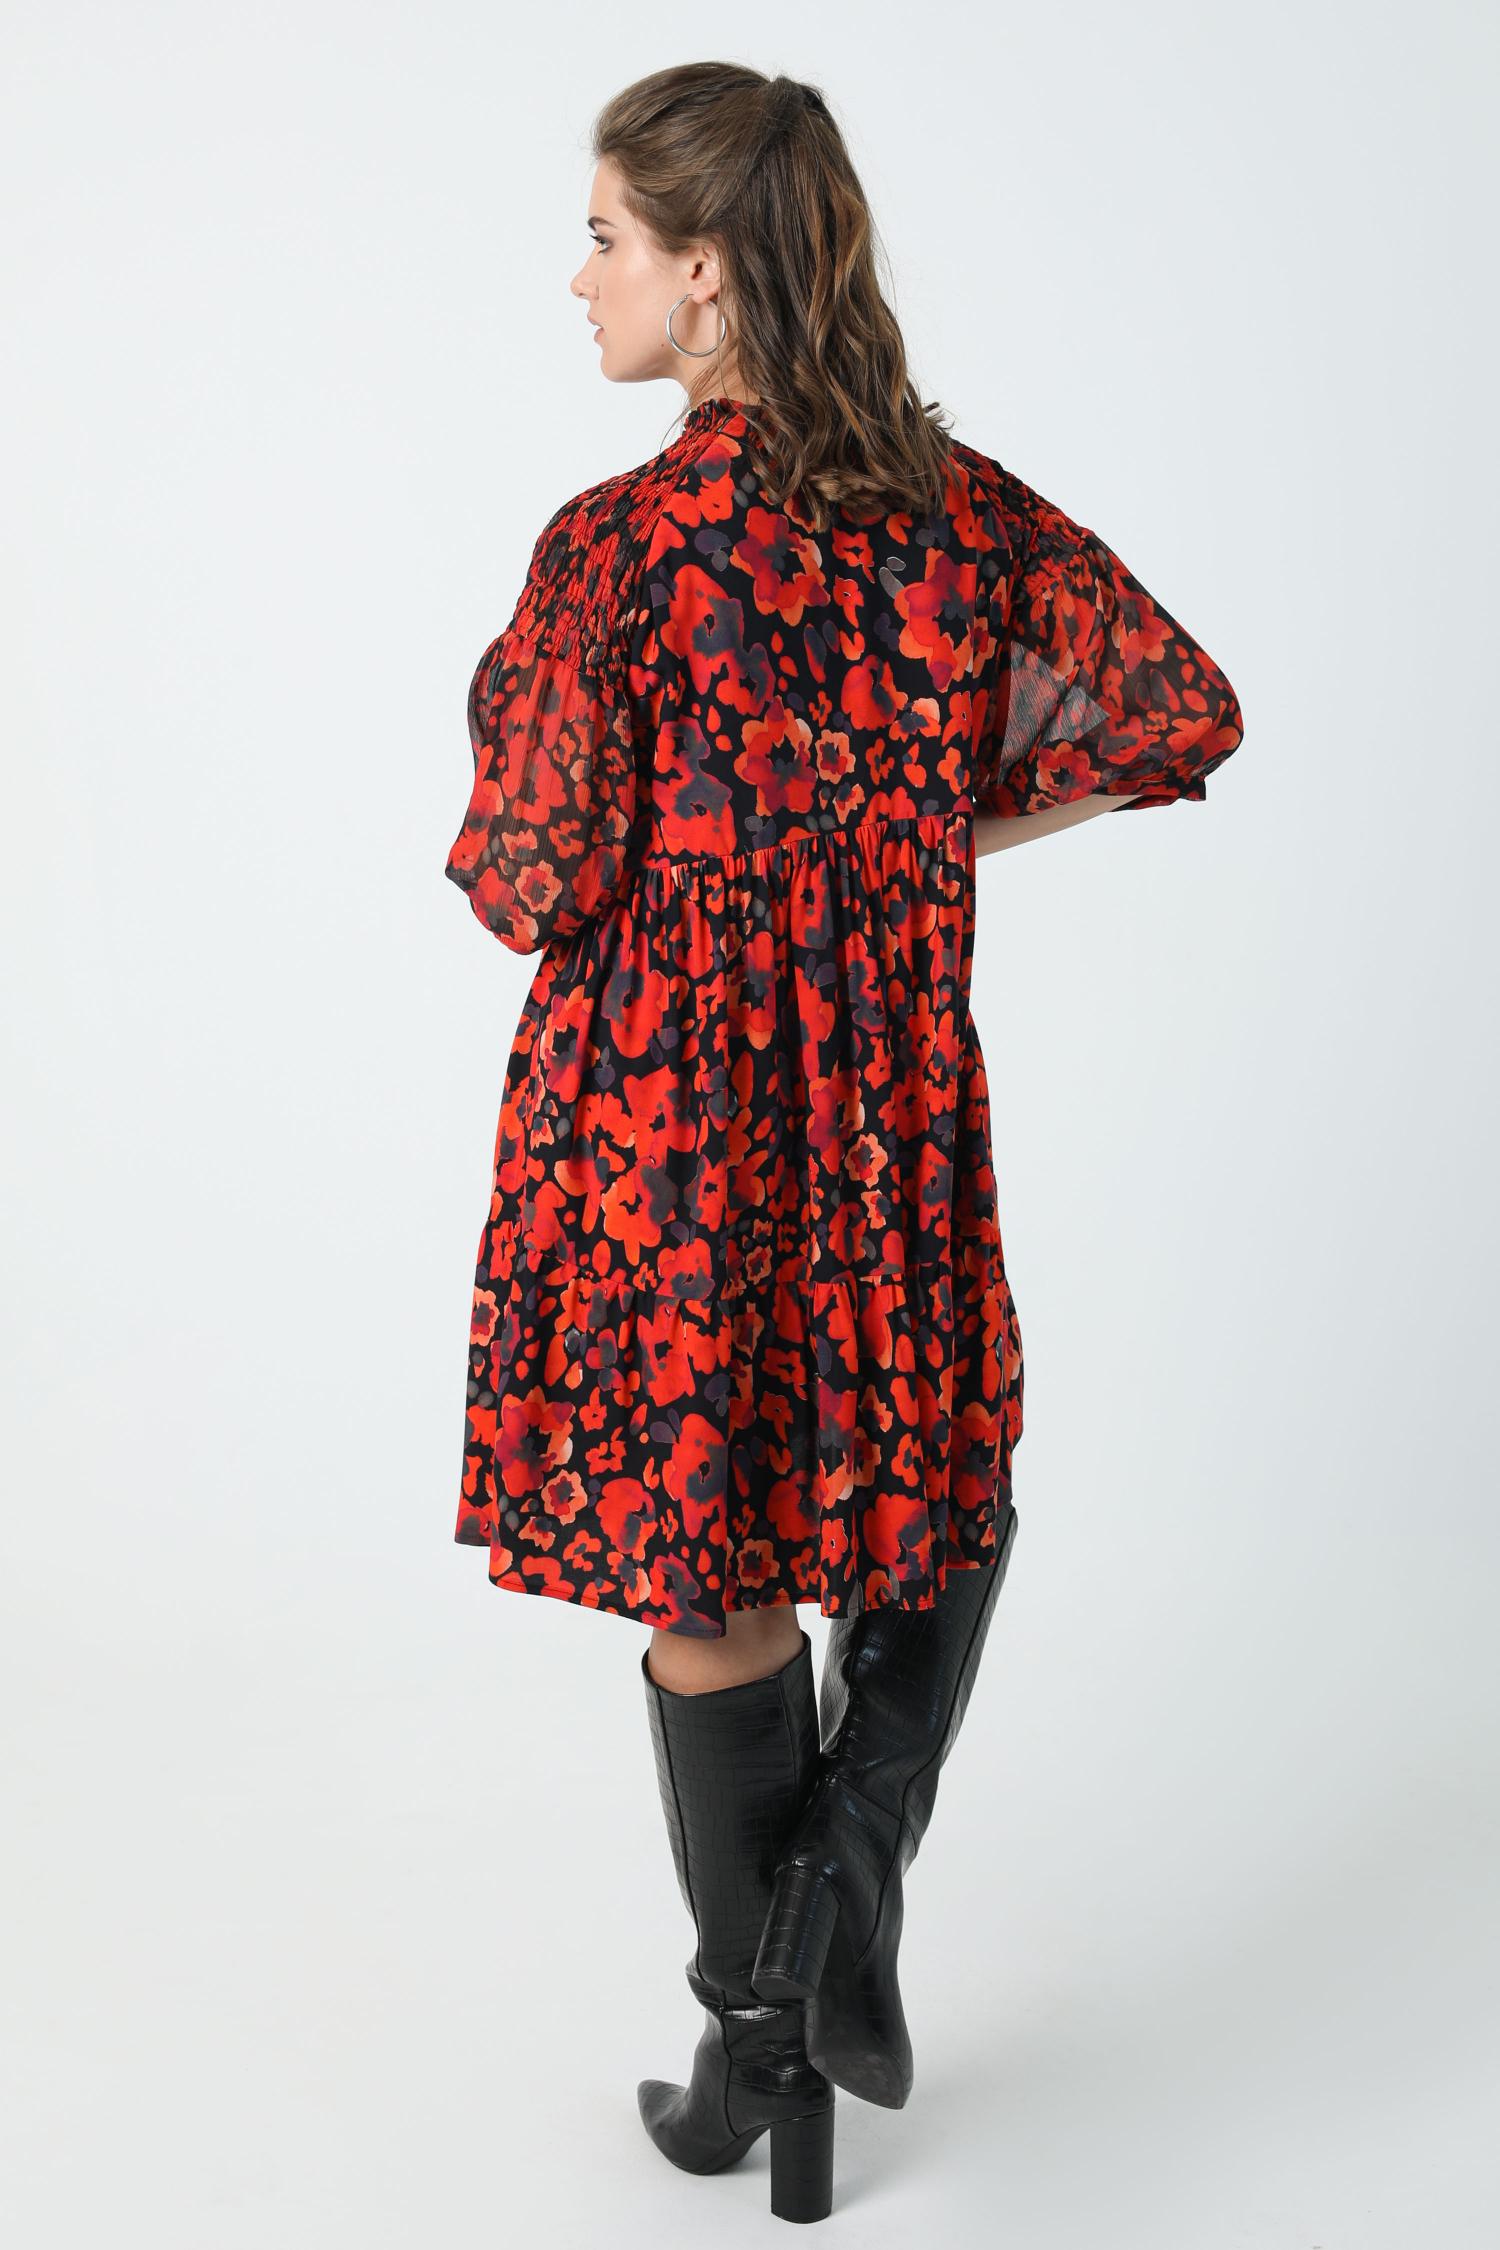 Printed midi dress with shoulder smocking